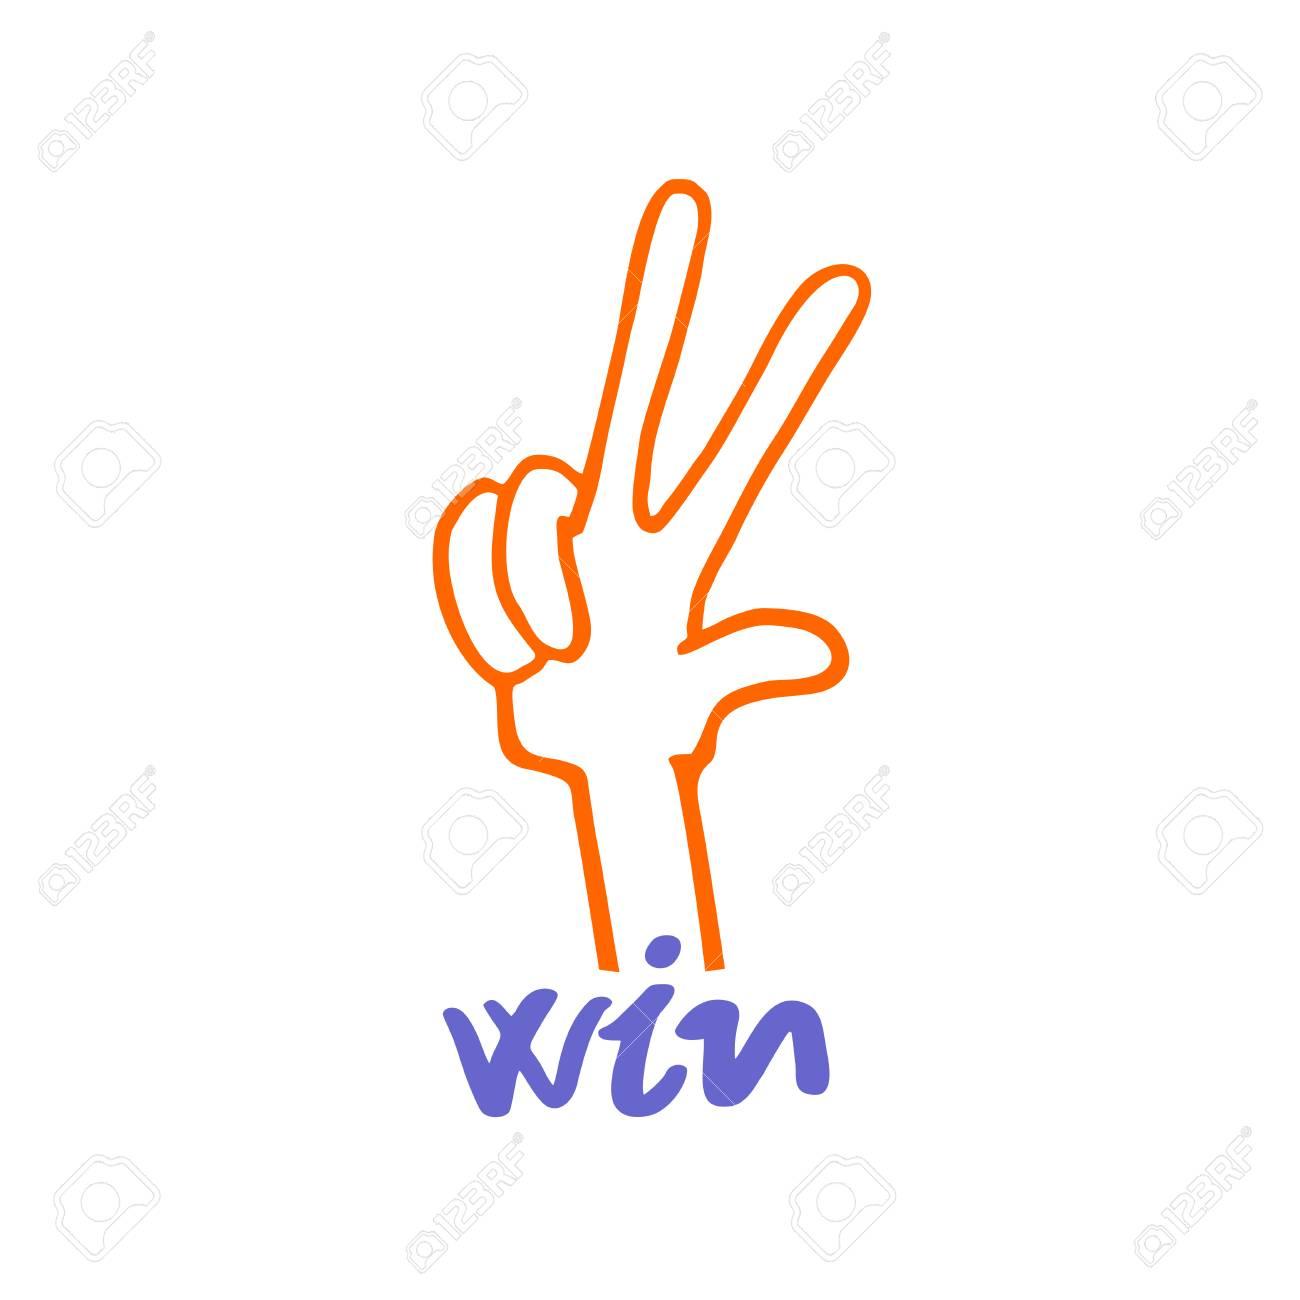 winner hand icon - 115098146